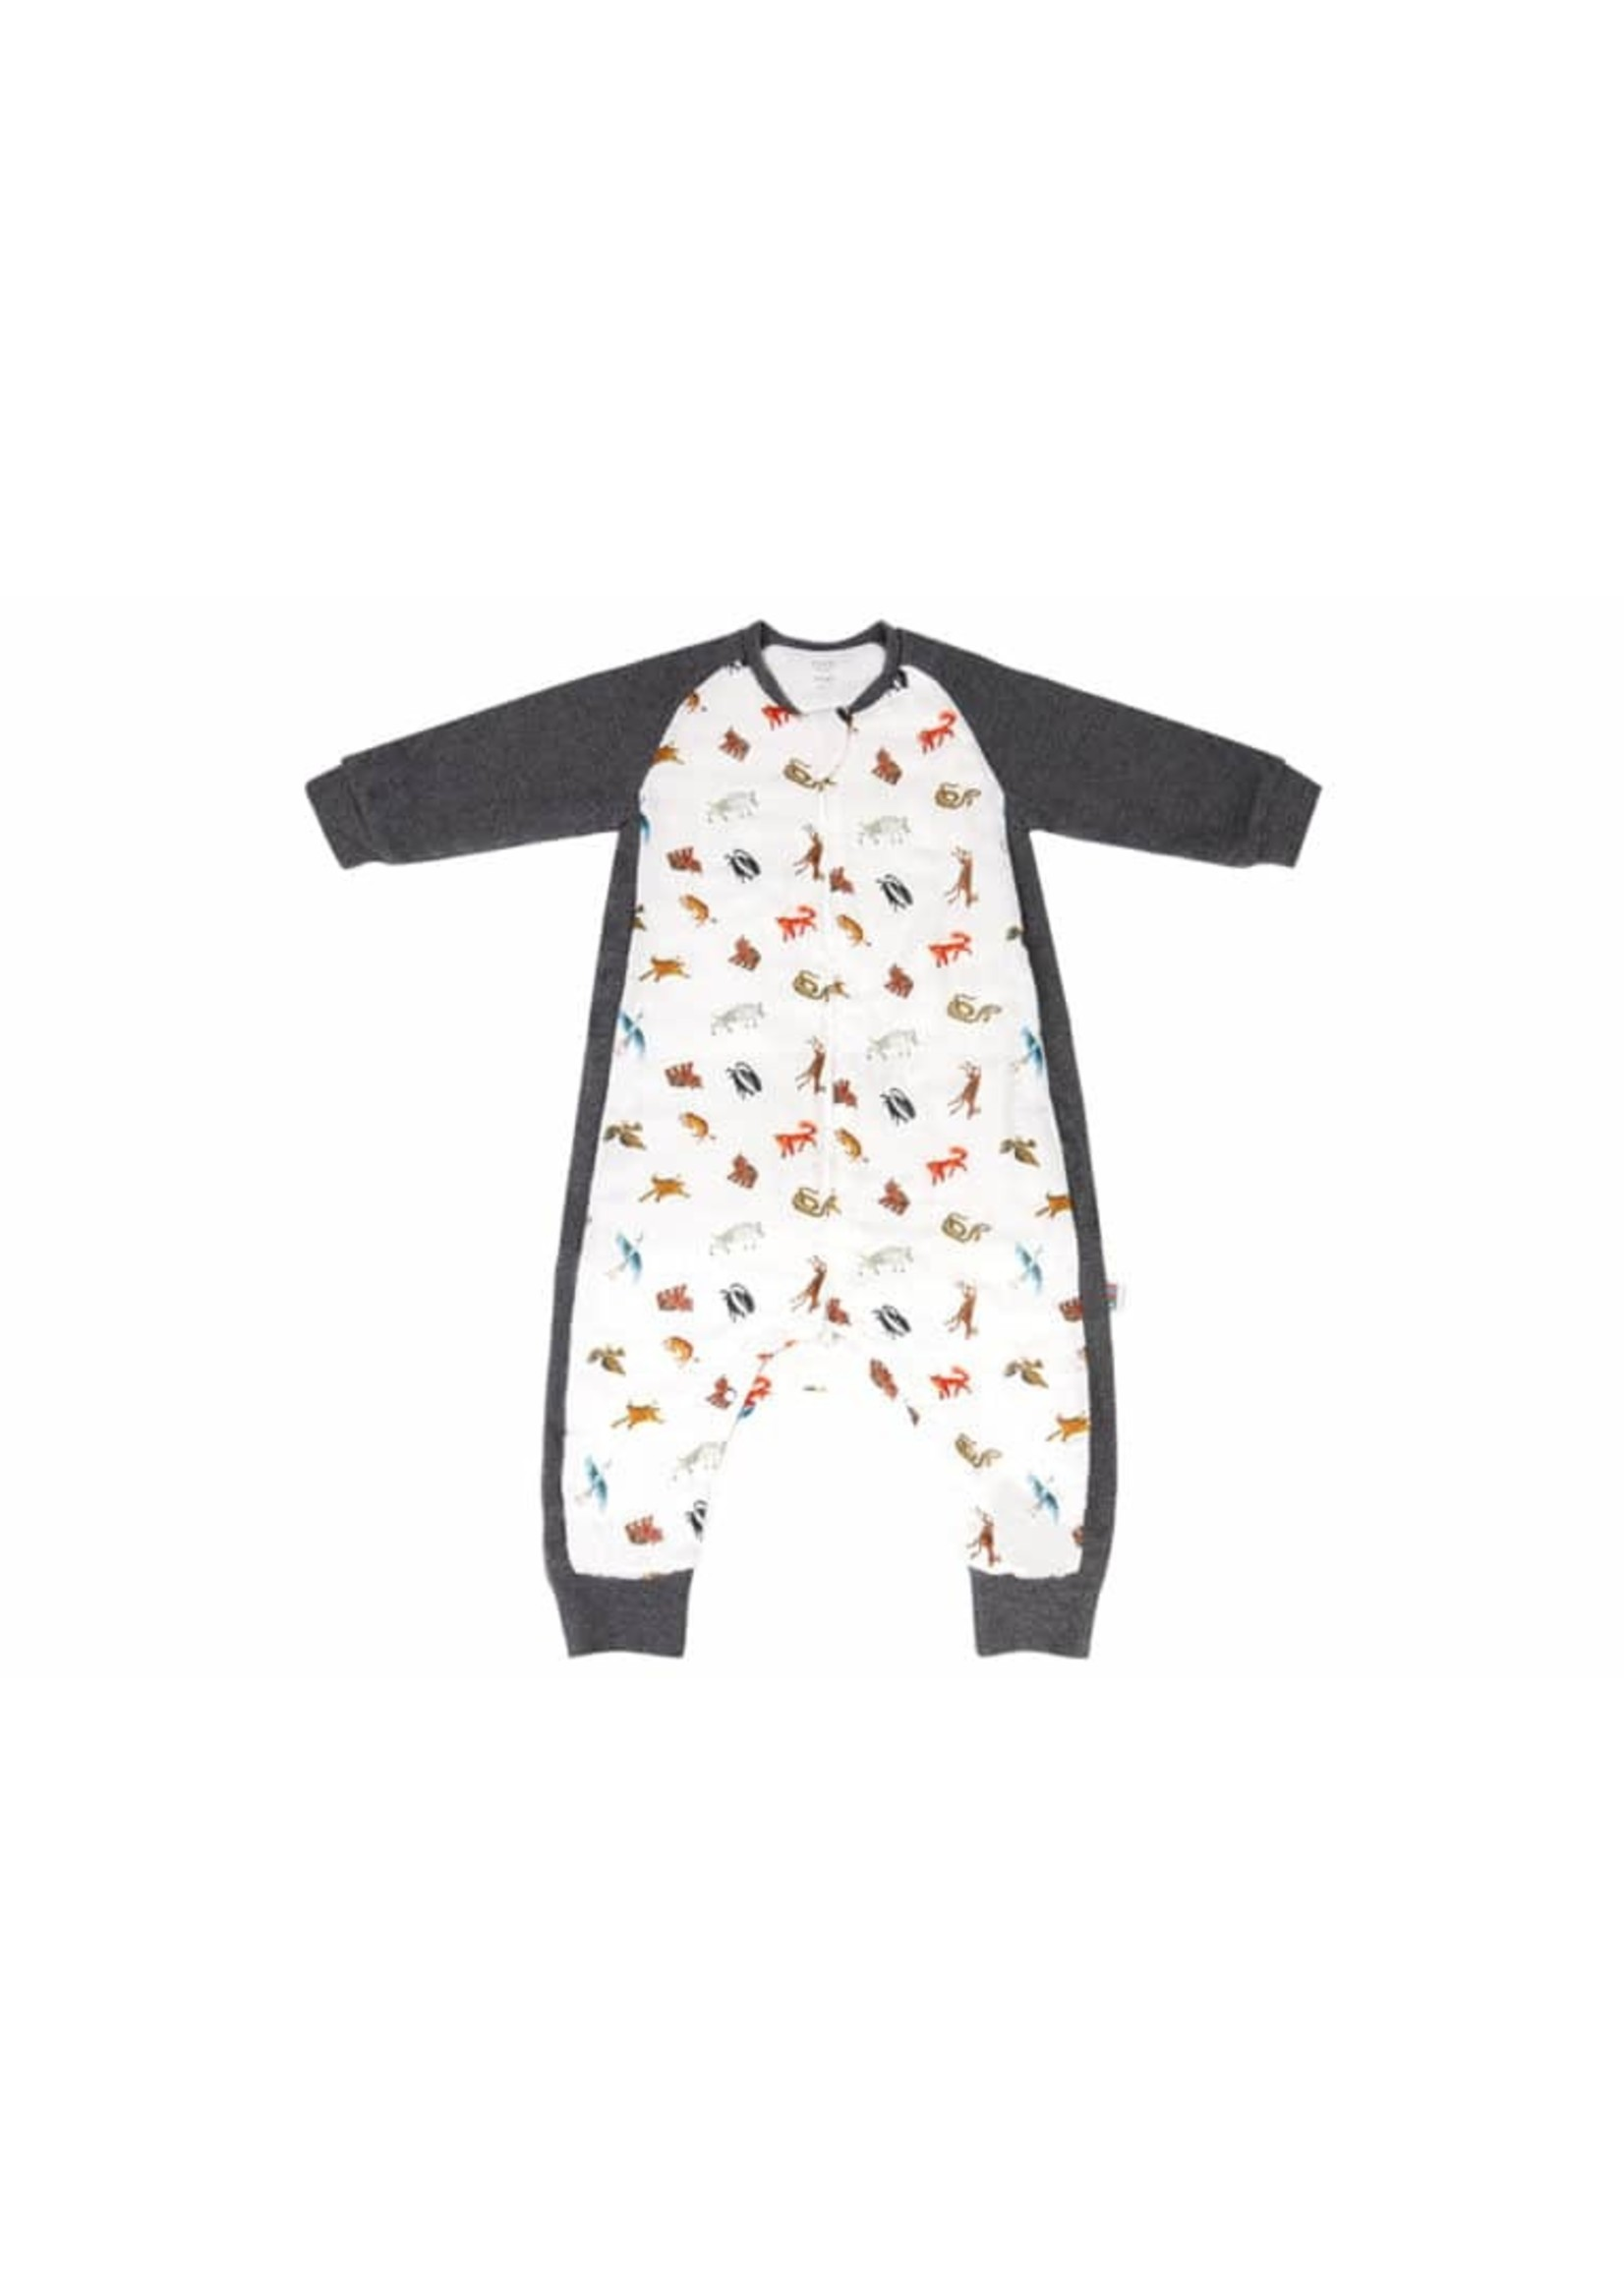 Nest Designs ND 2.5 Sleep Suit (Baby Bear- Longsleeve)